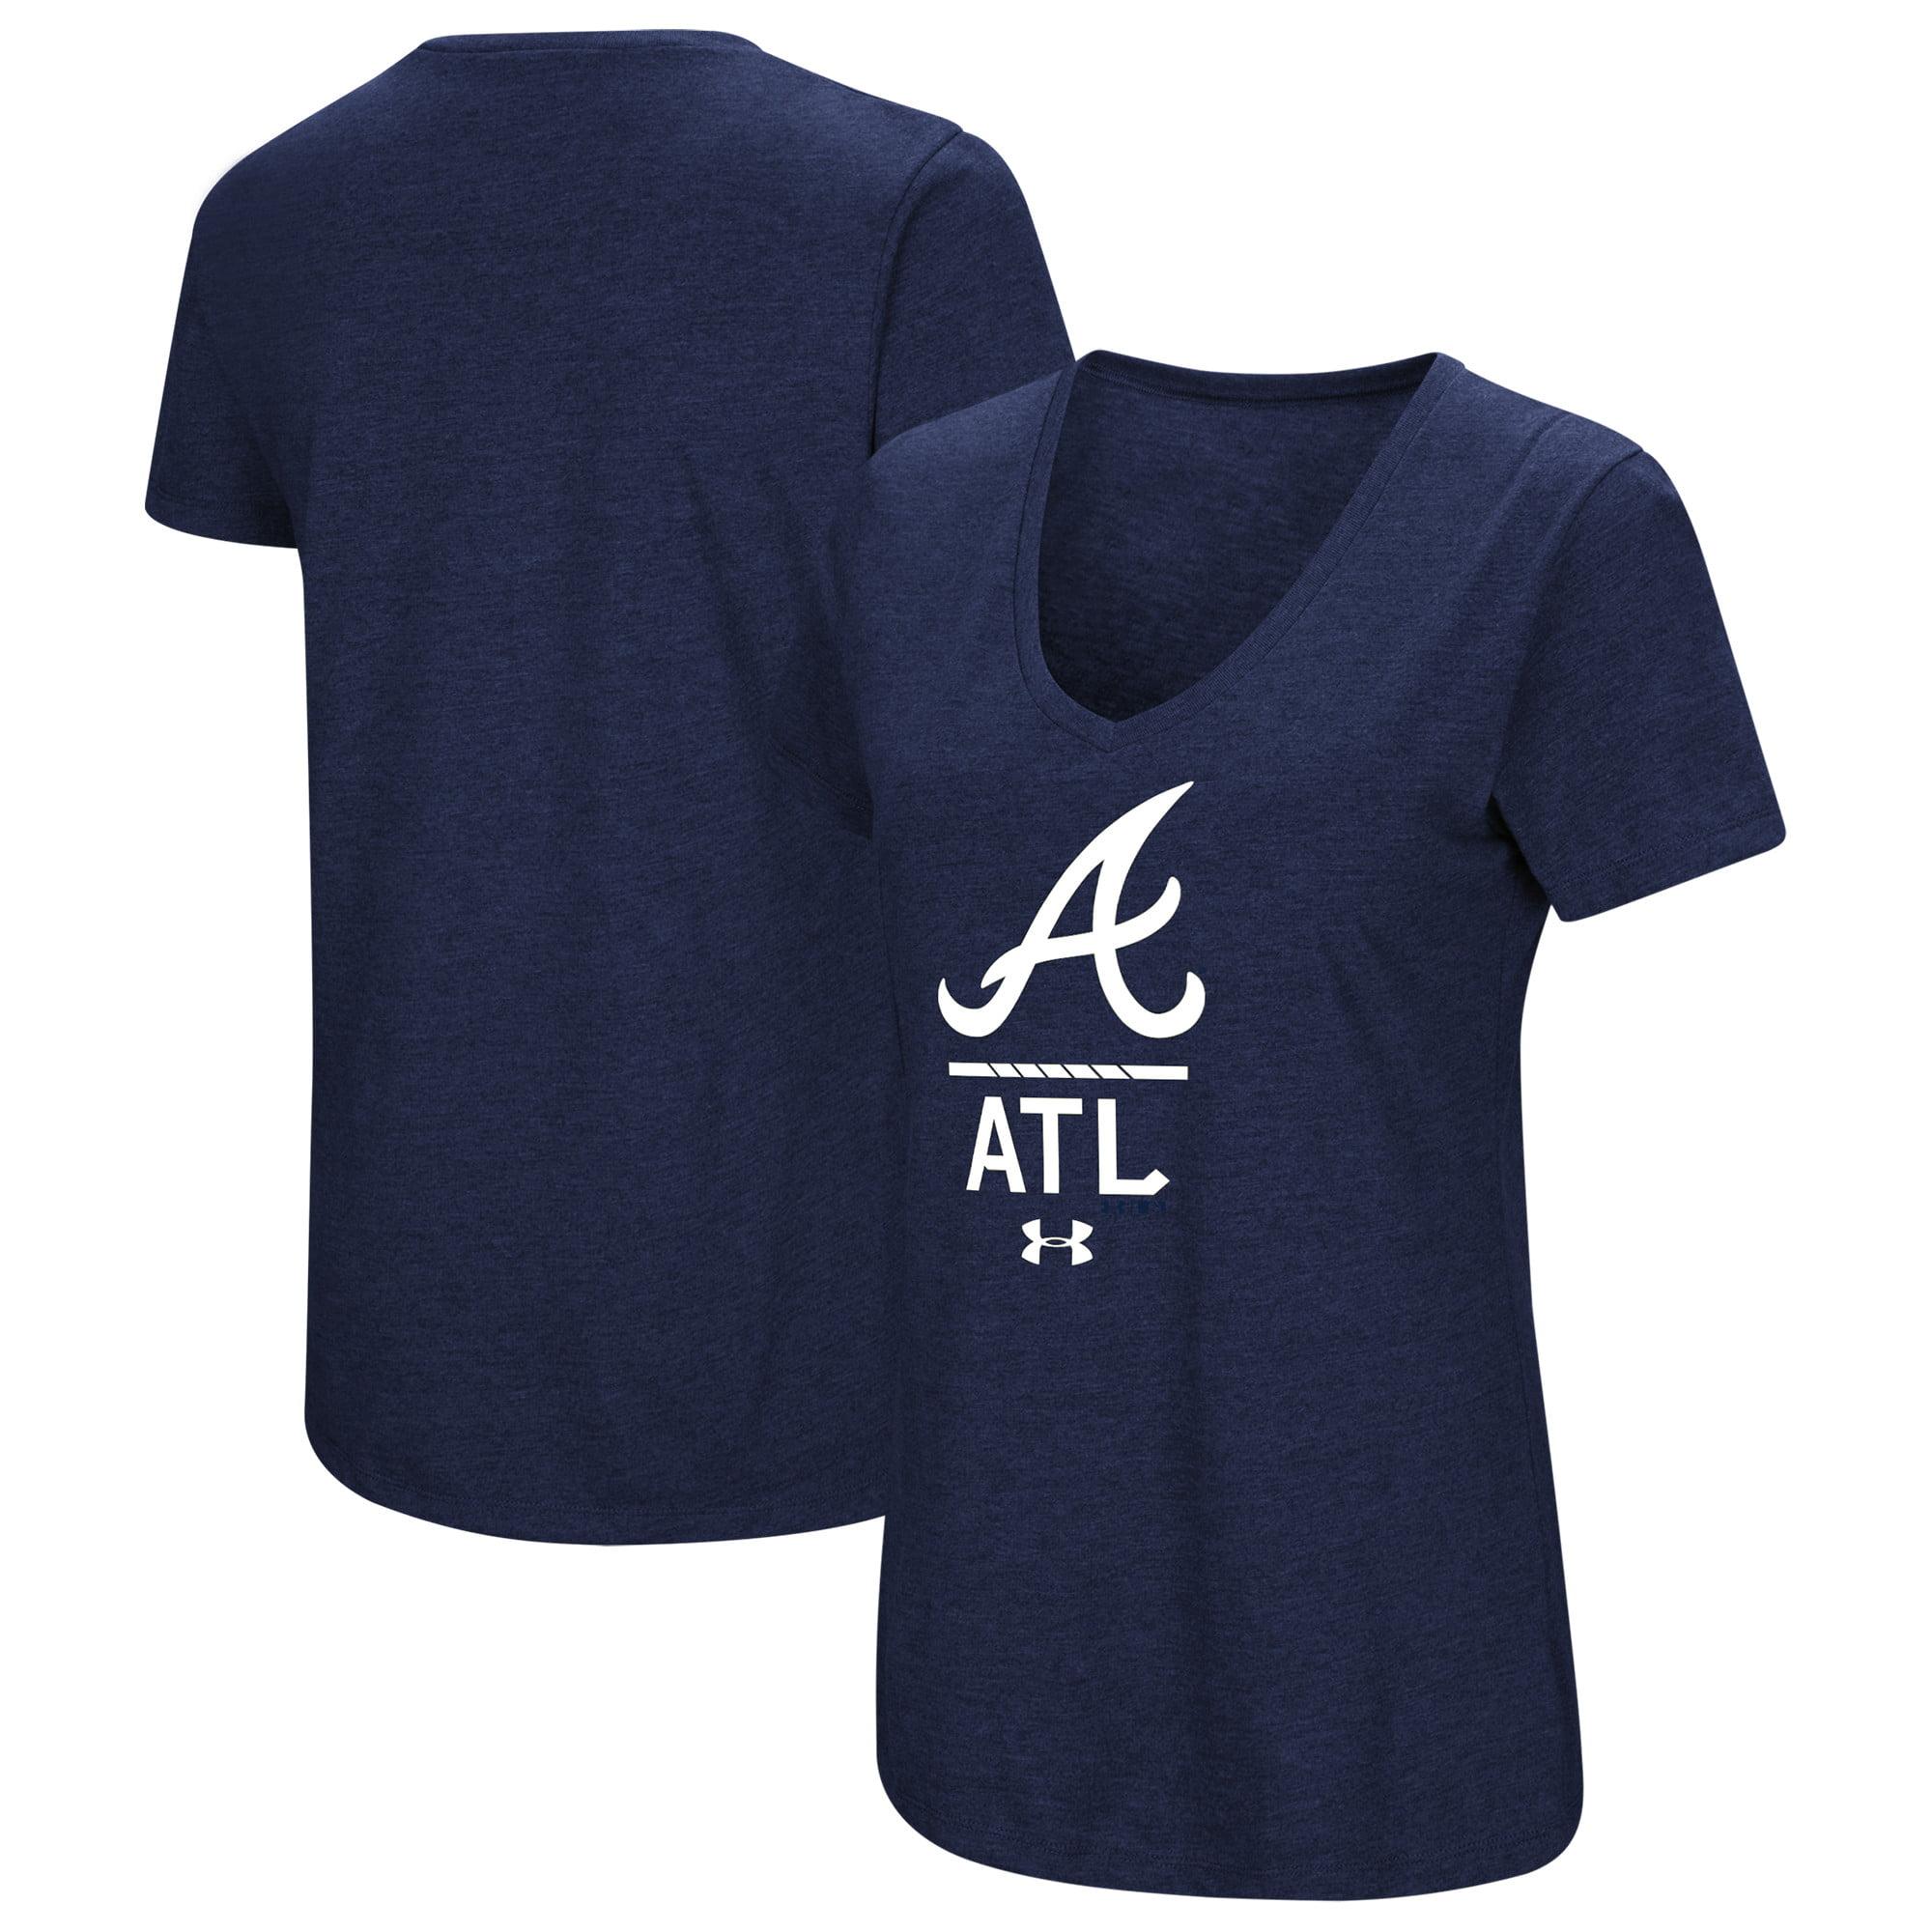 Atlanta Braves Under Armour Women's Team Lock-Up Performance Tri-Blend V-Neck T-Shirt - Navy